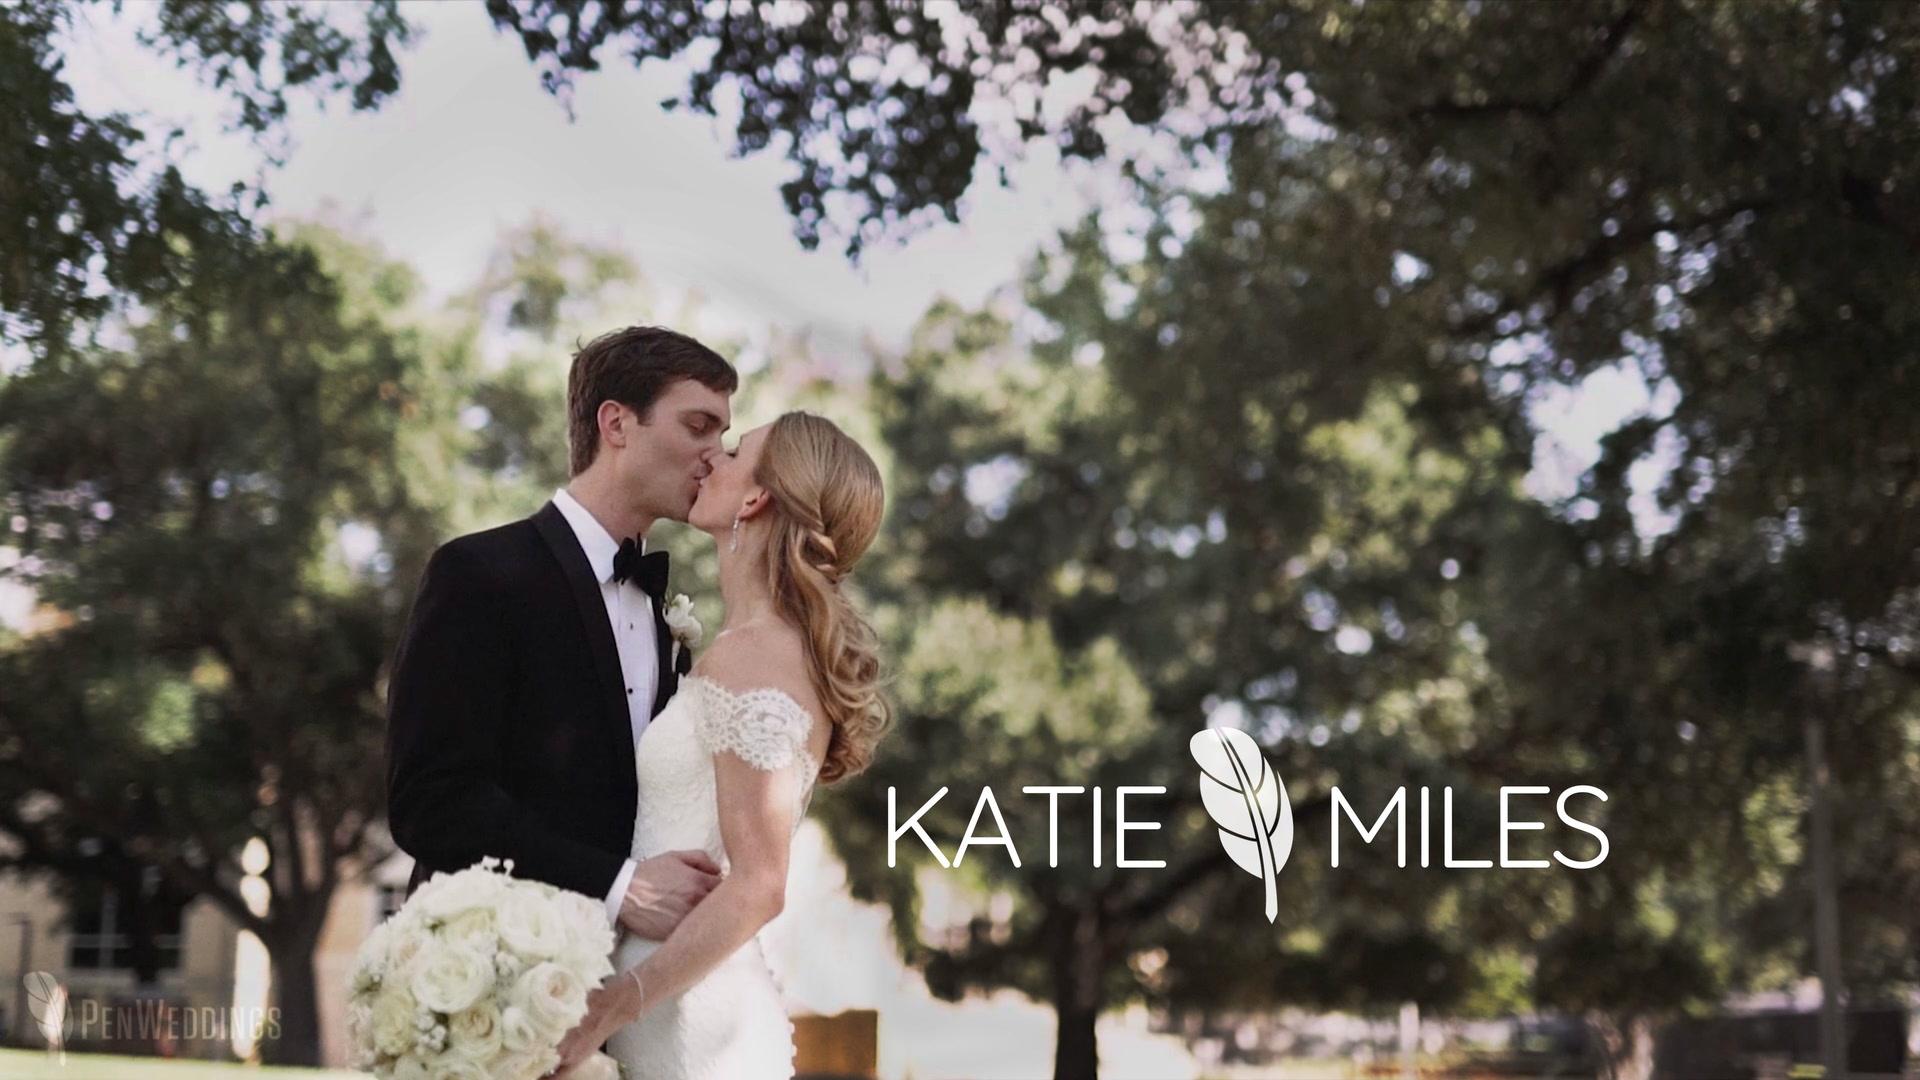 Katie + Miles | Fort Worth, Texas | Fort Worth Club